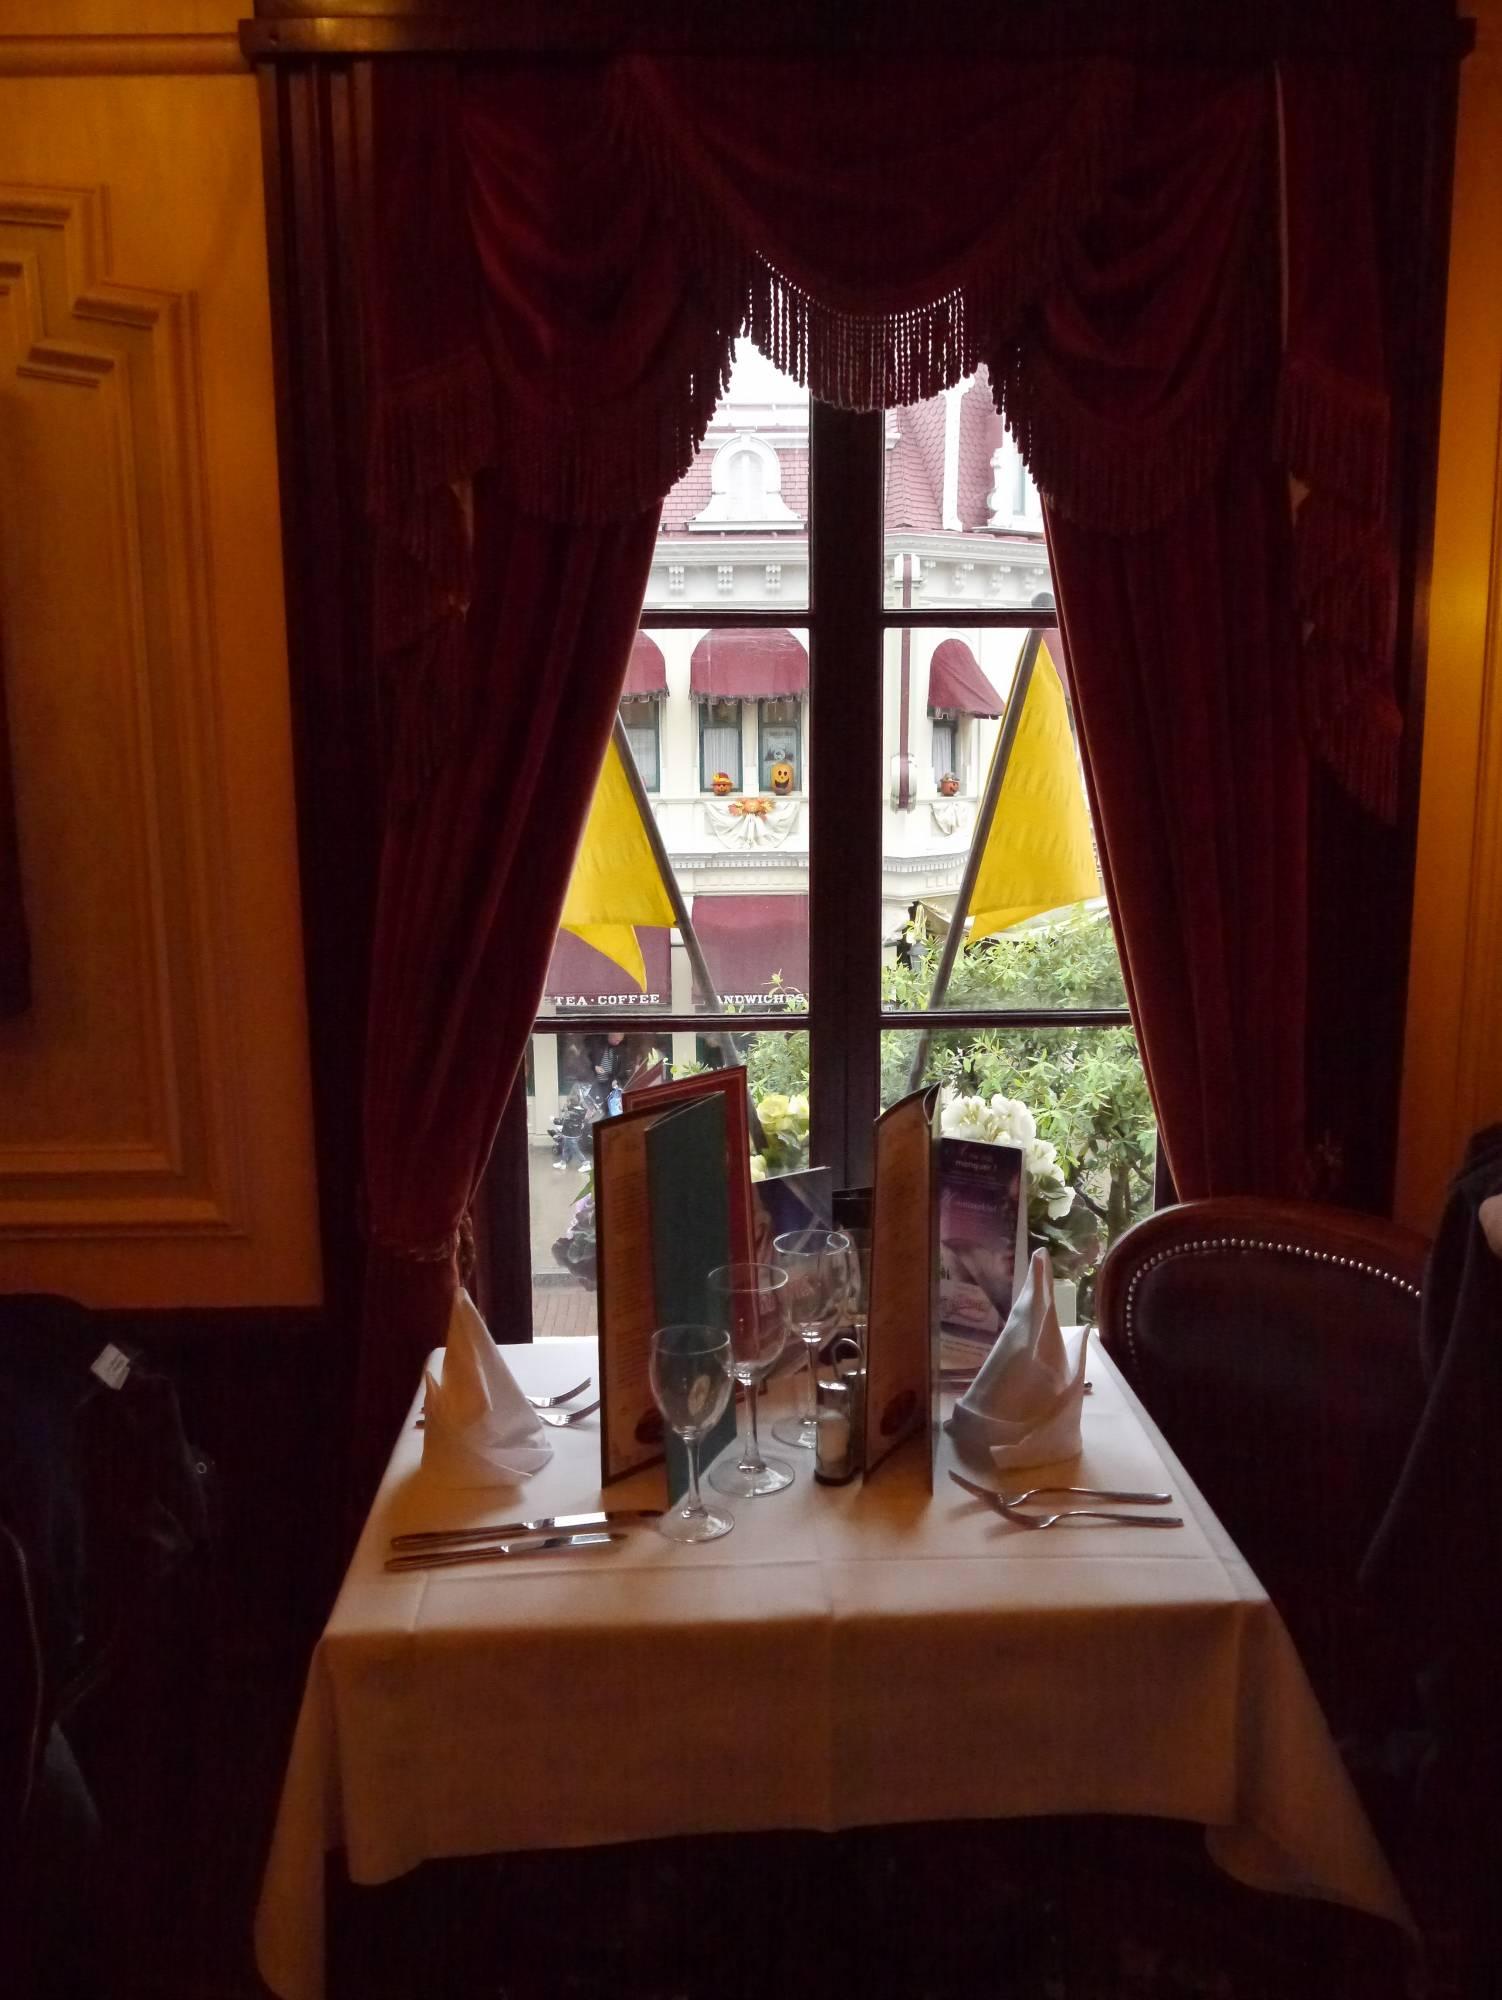 Enjoy an American Meal in Disneyland Paris |PassPorter.com